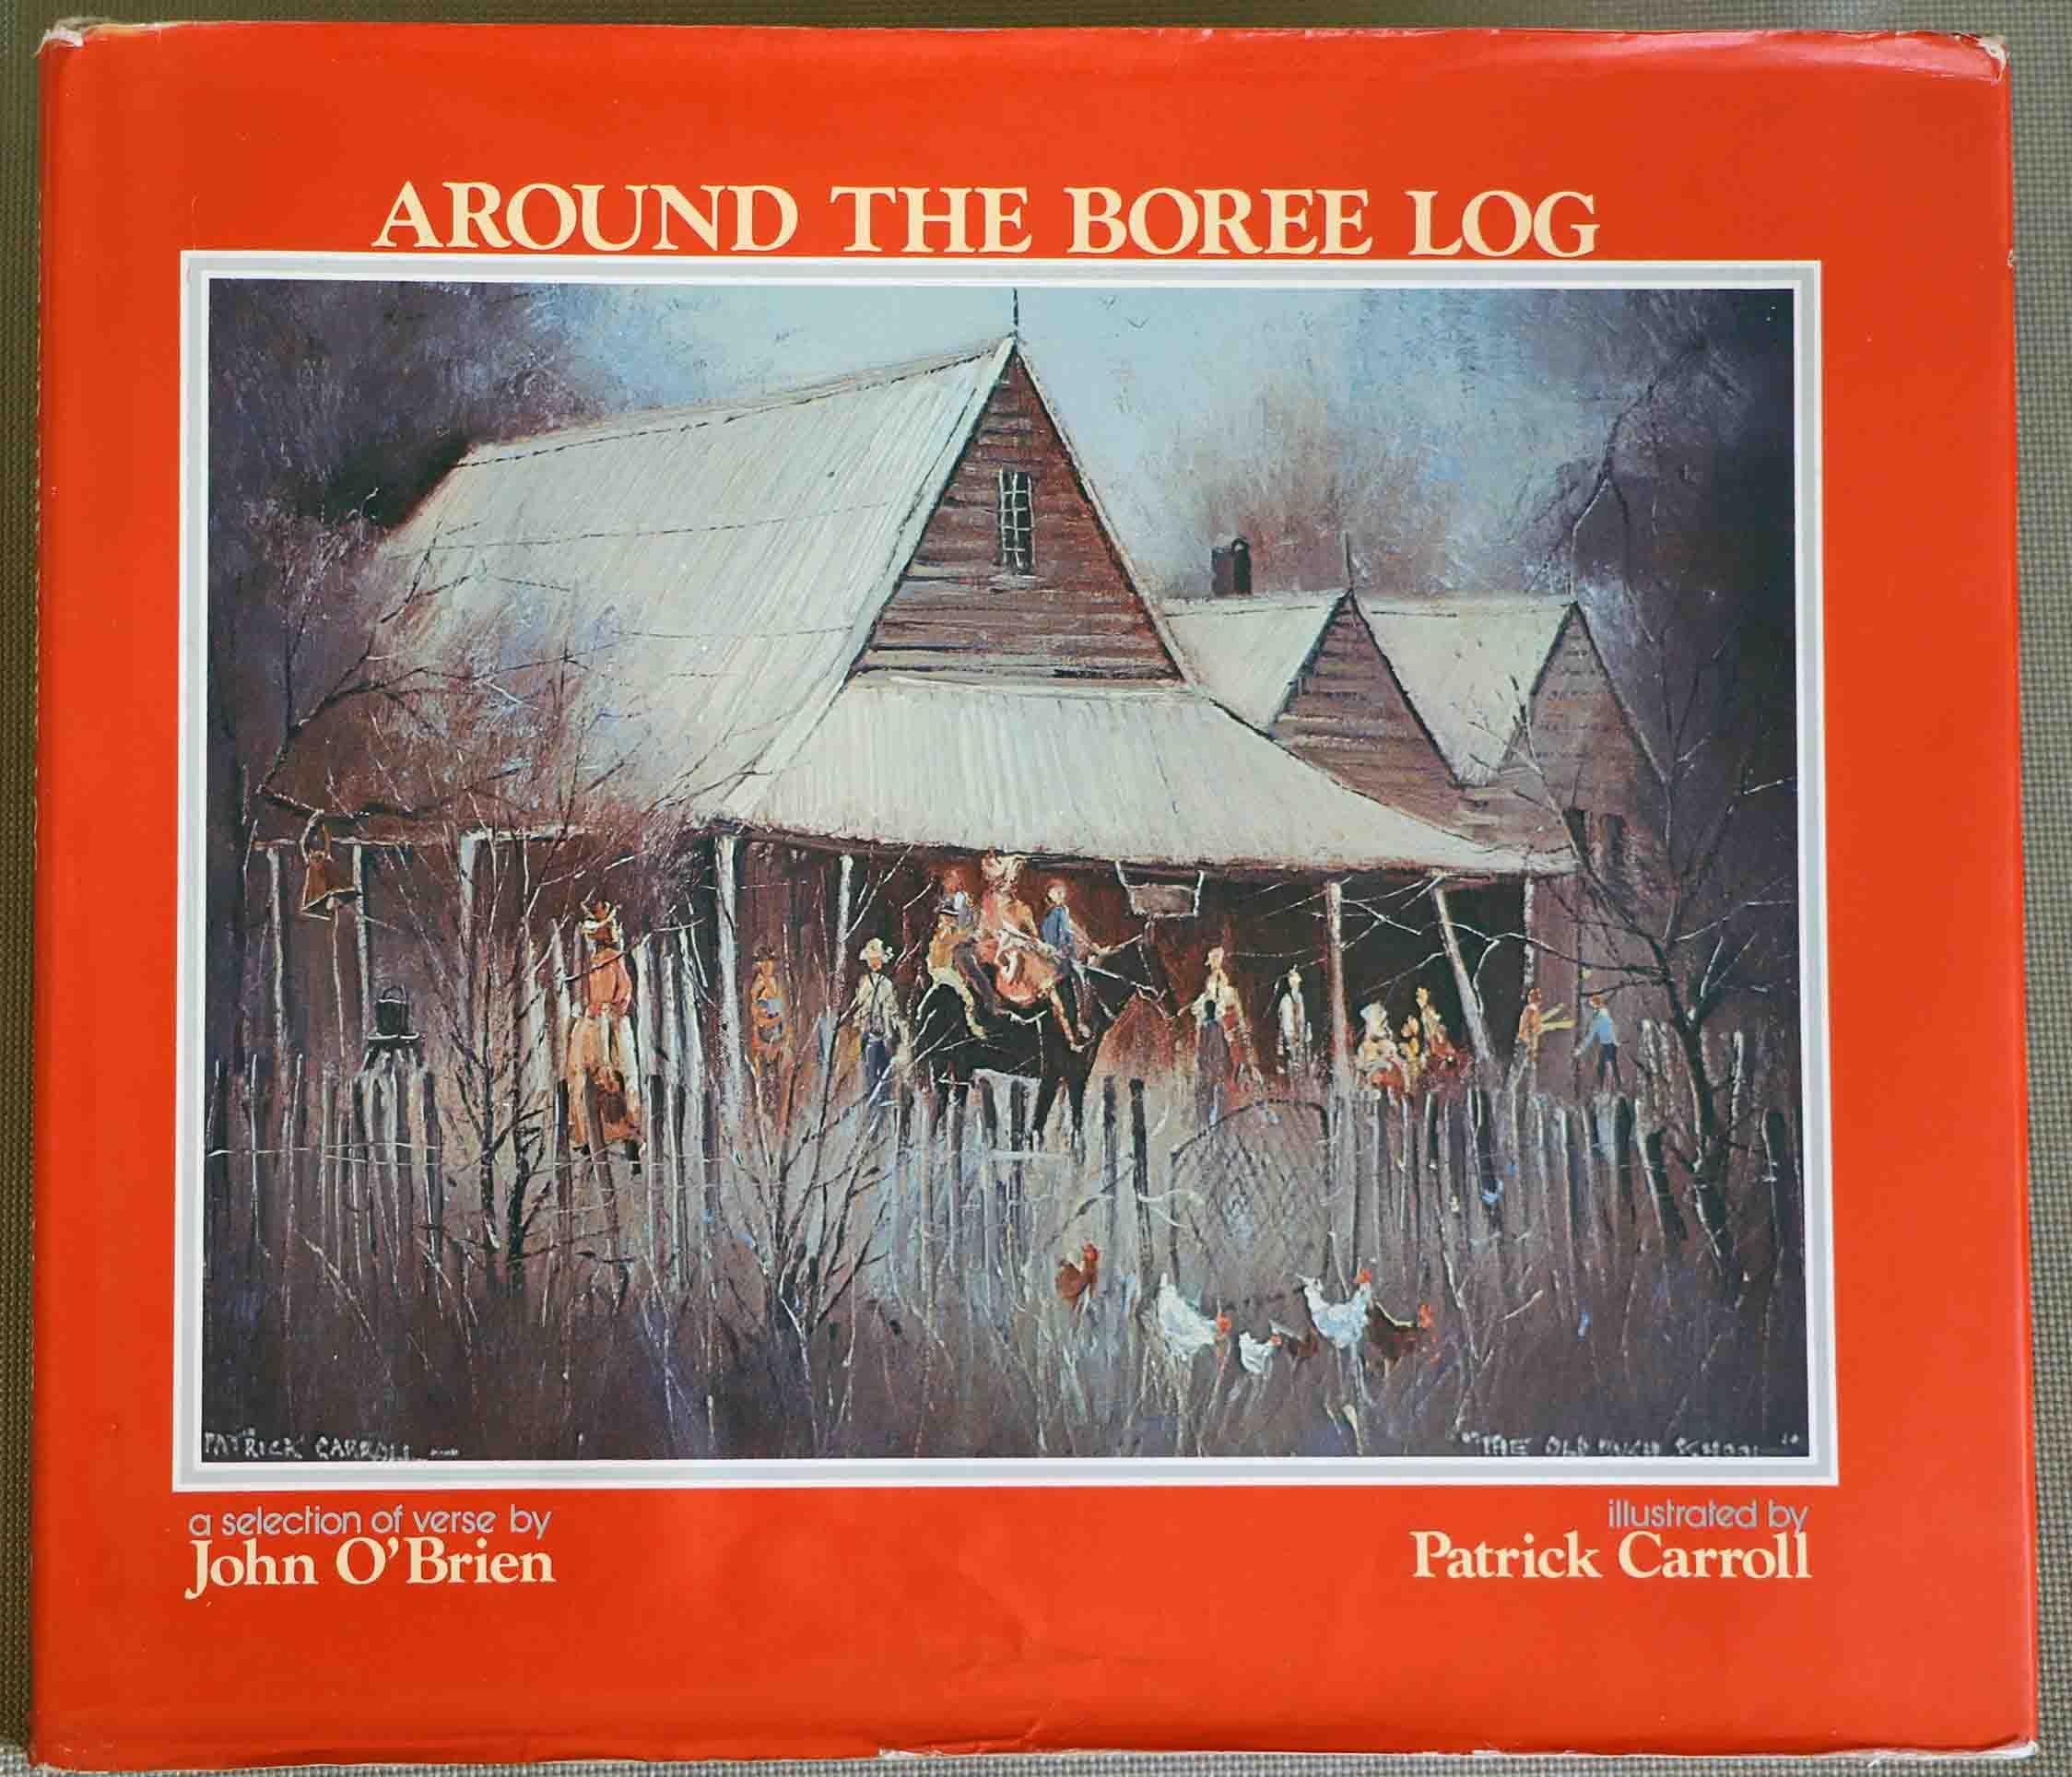 Around the BOREE LOG Hardcover Vintage Book by John O